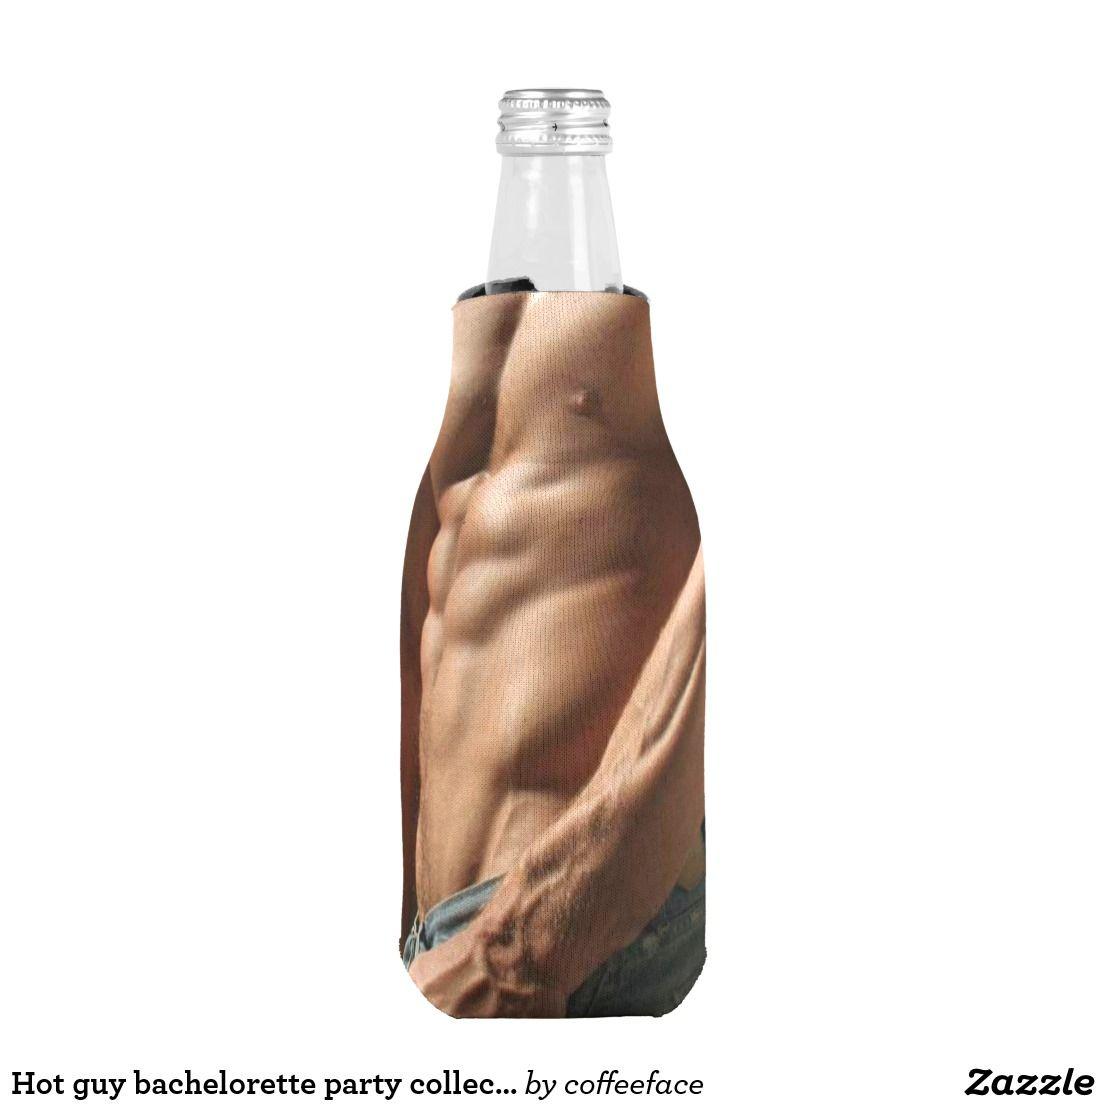 Hot guy bachelorette party collection bottle cooler